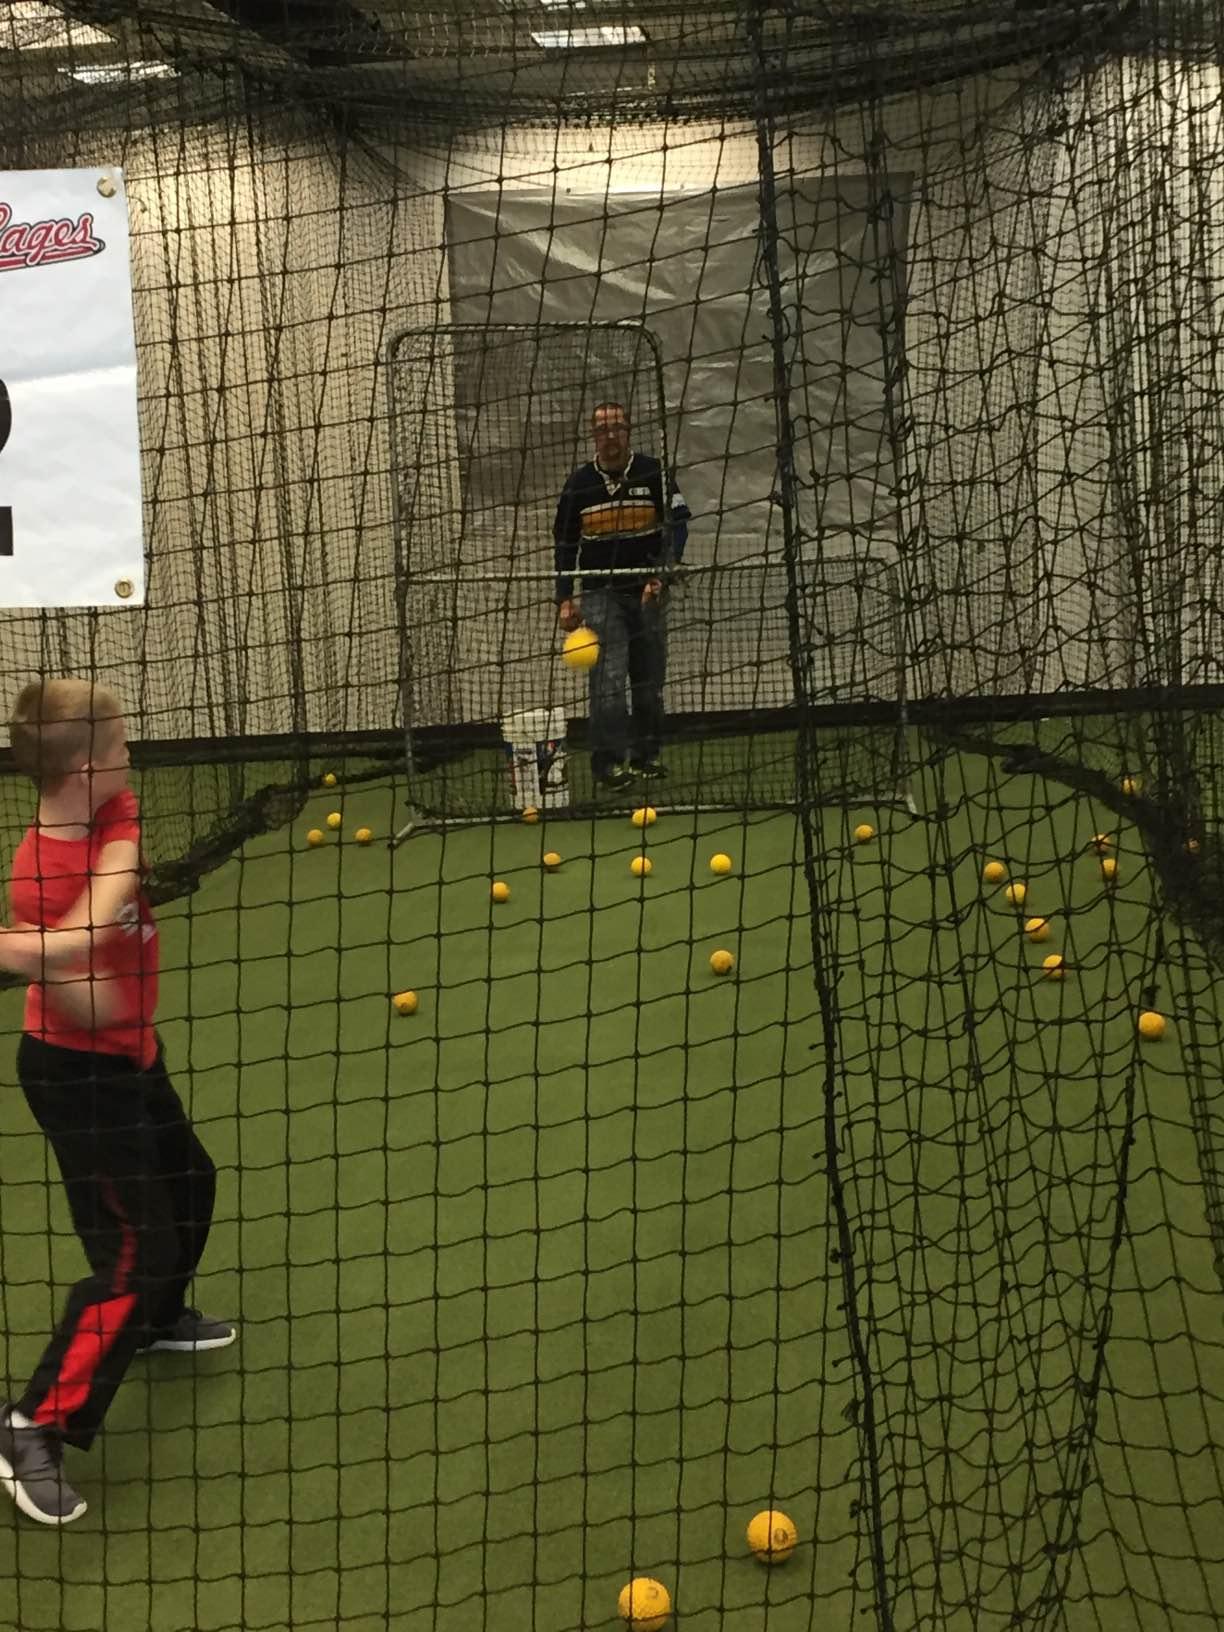 Batting Cages in Warrenton